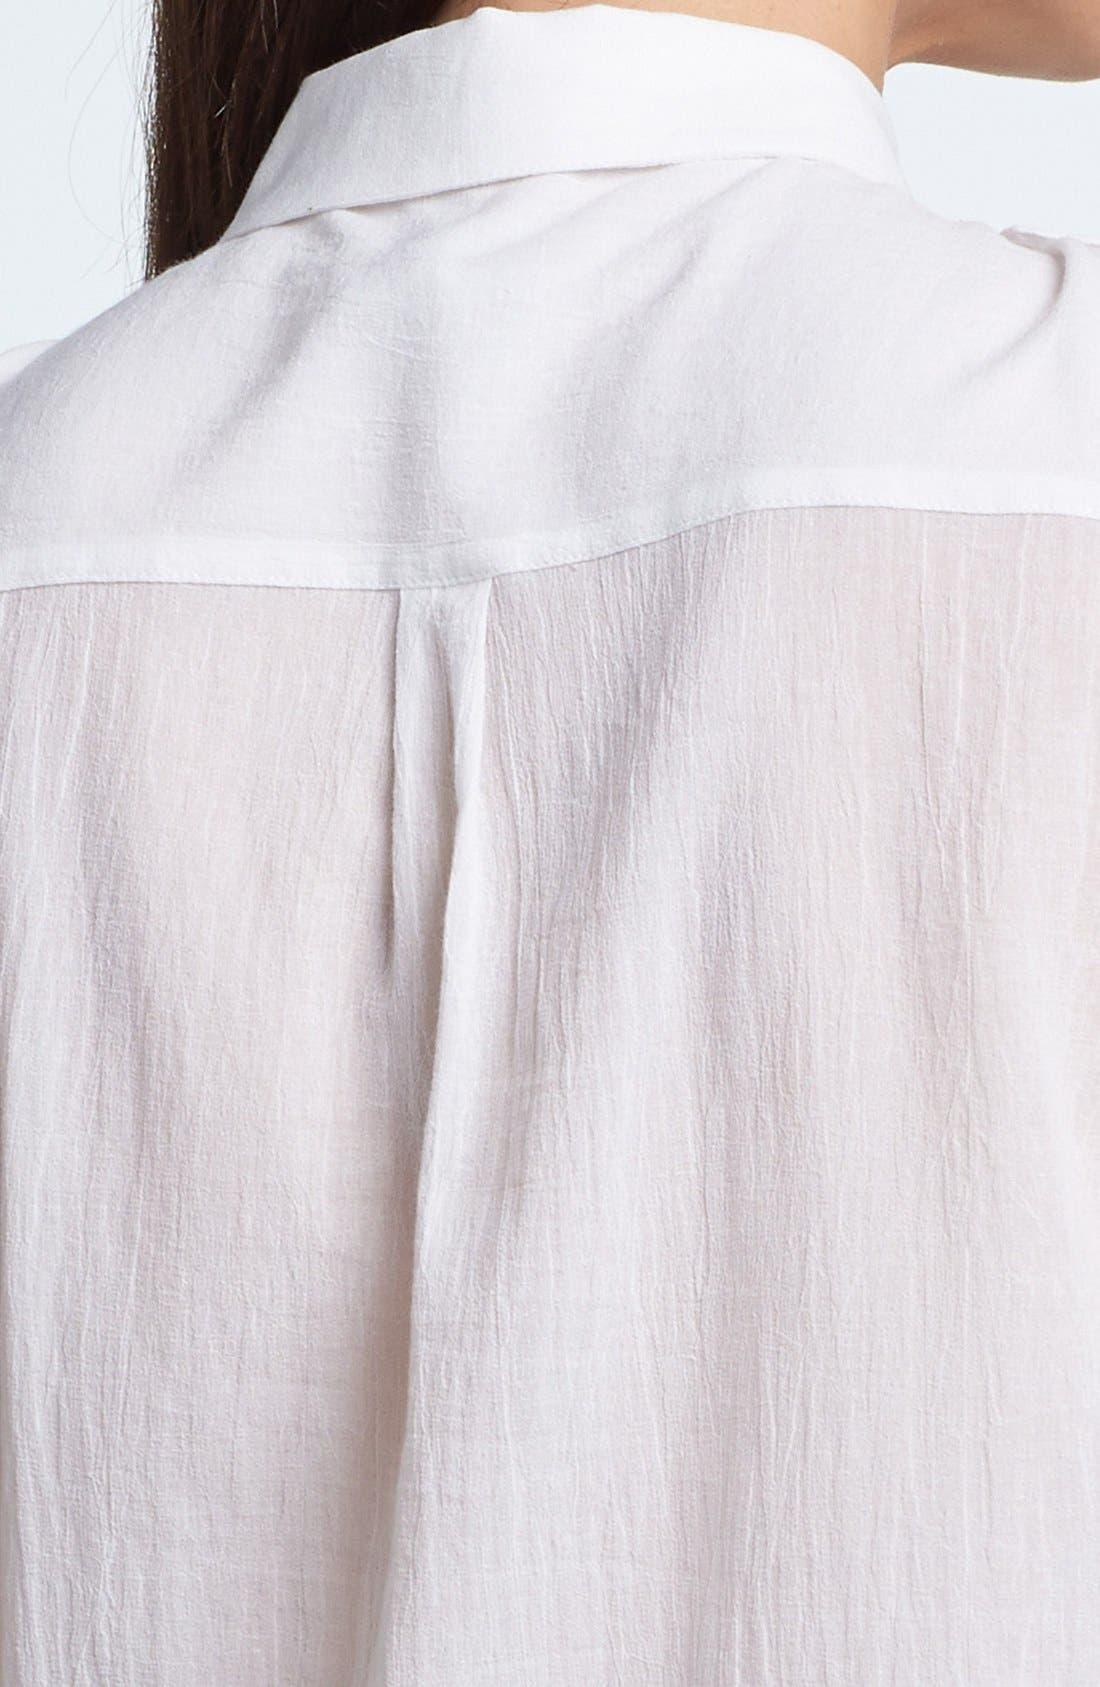 JOIE,                             'Philana' Shirt,                             Alternate thumbnail 2, color,                             114